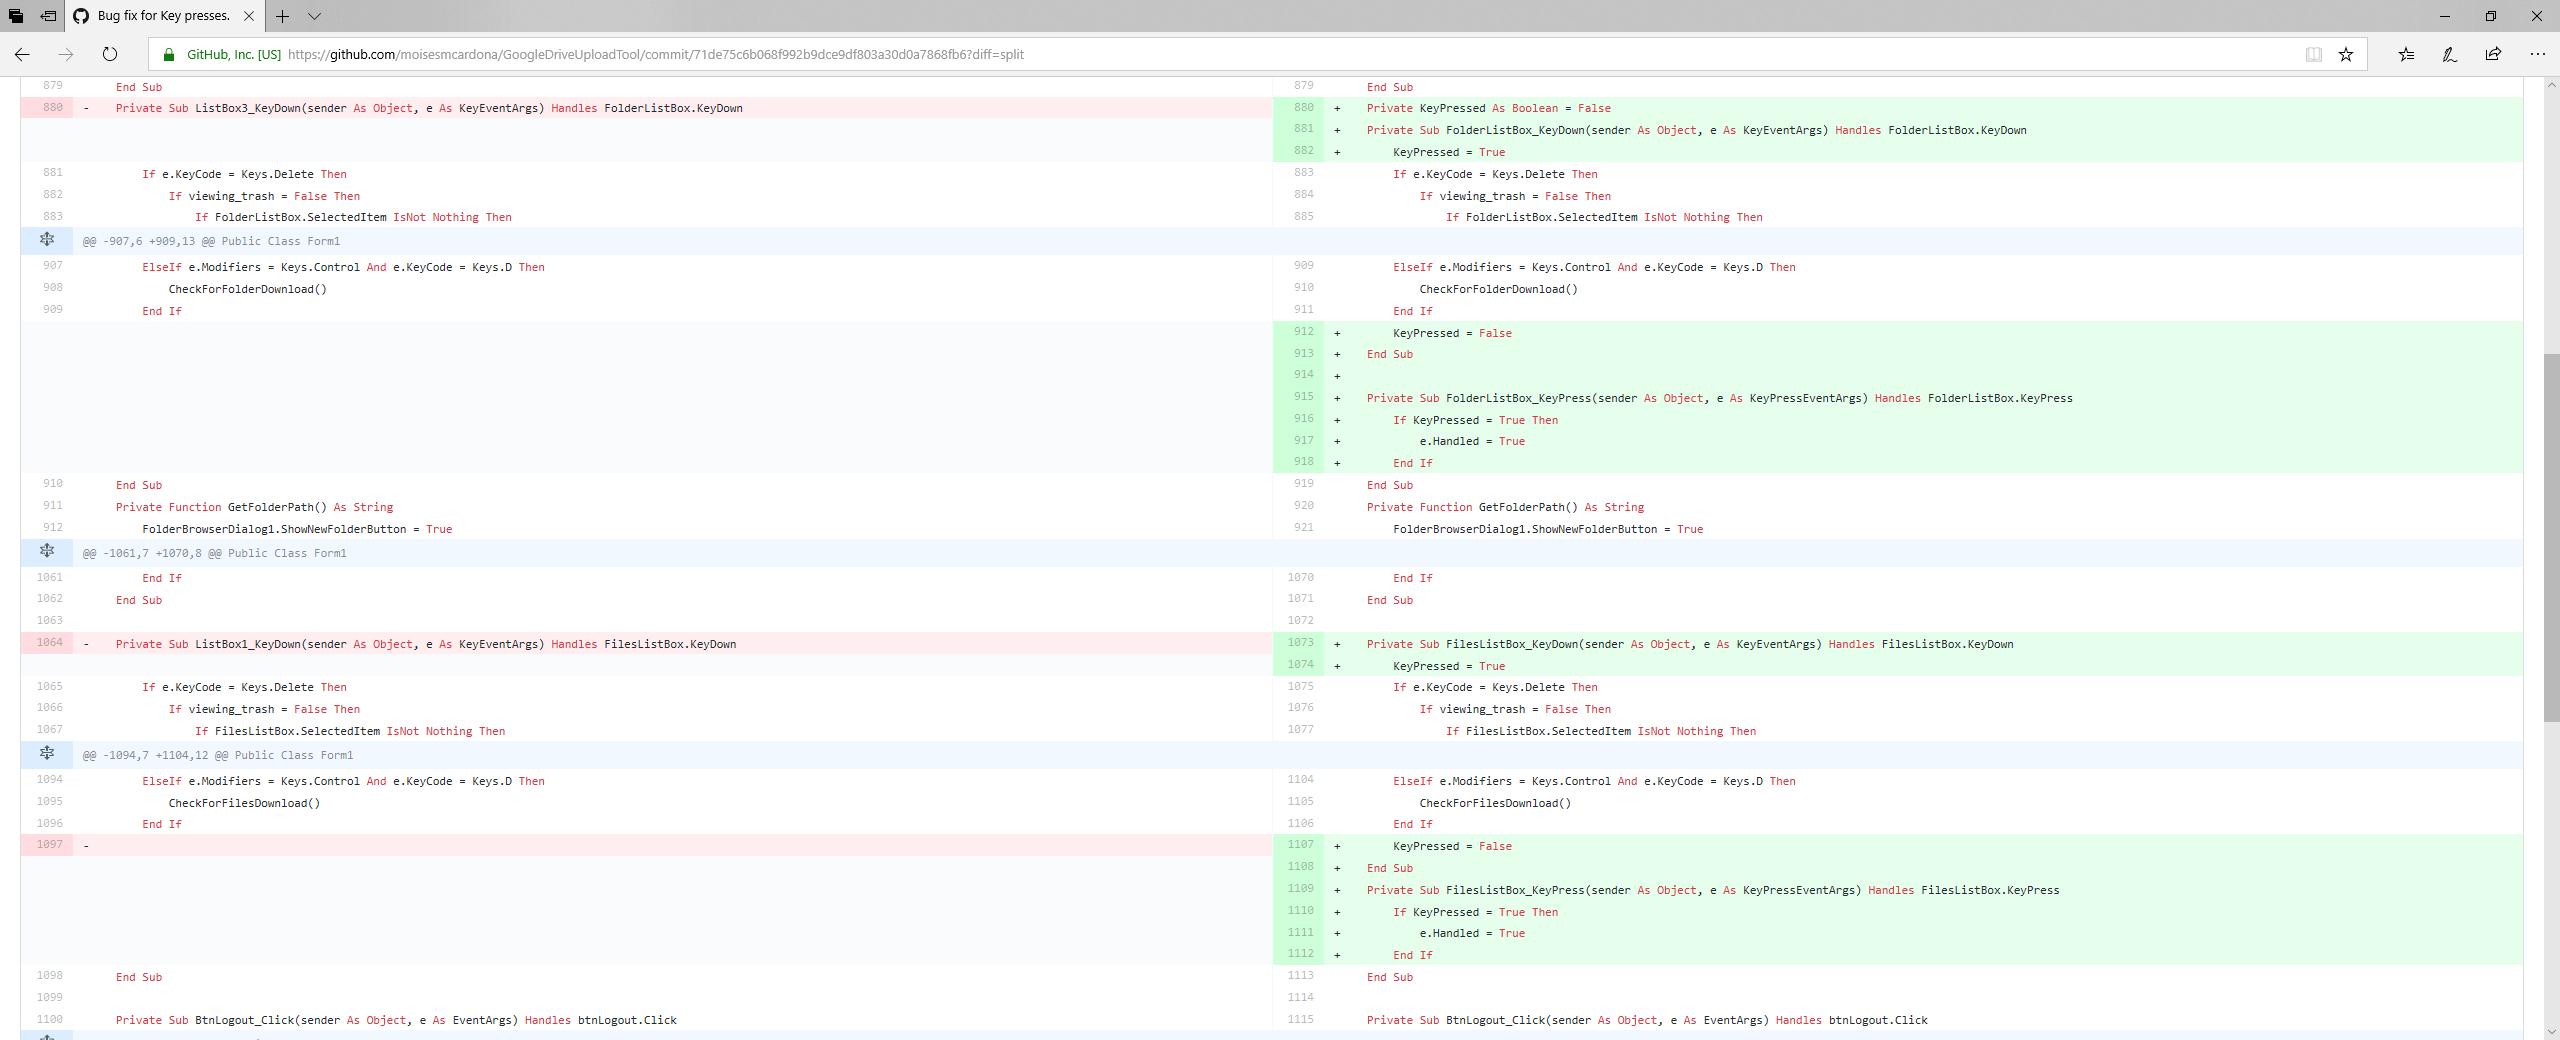 Google Drive Upload Tool v1.8.2 - 2